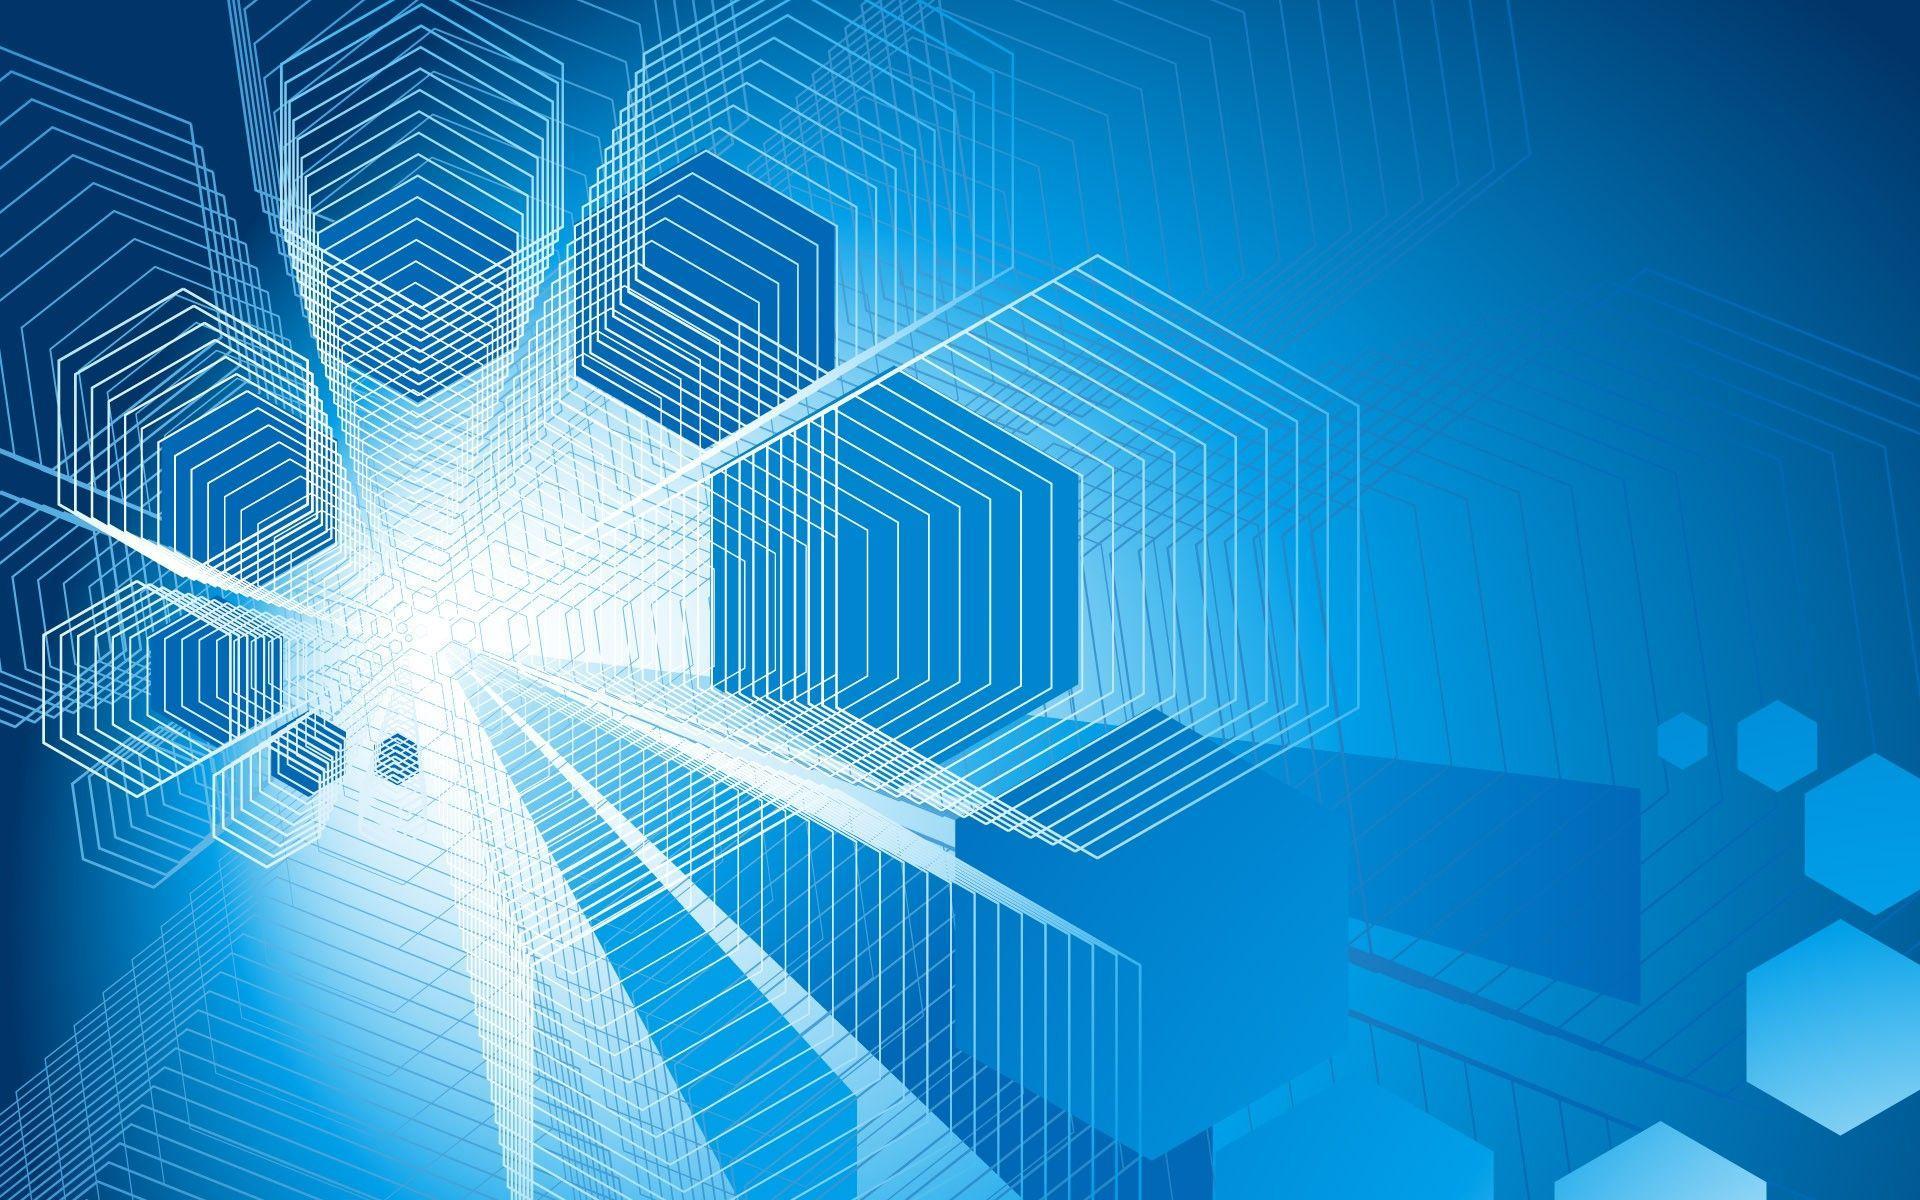 Full 4k Tech Wallpapers Top Free Full 4k Tech Backgrounds